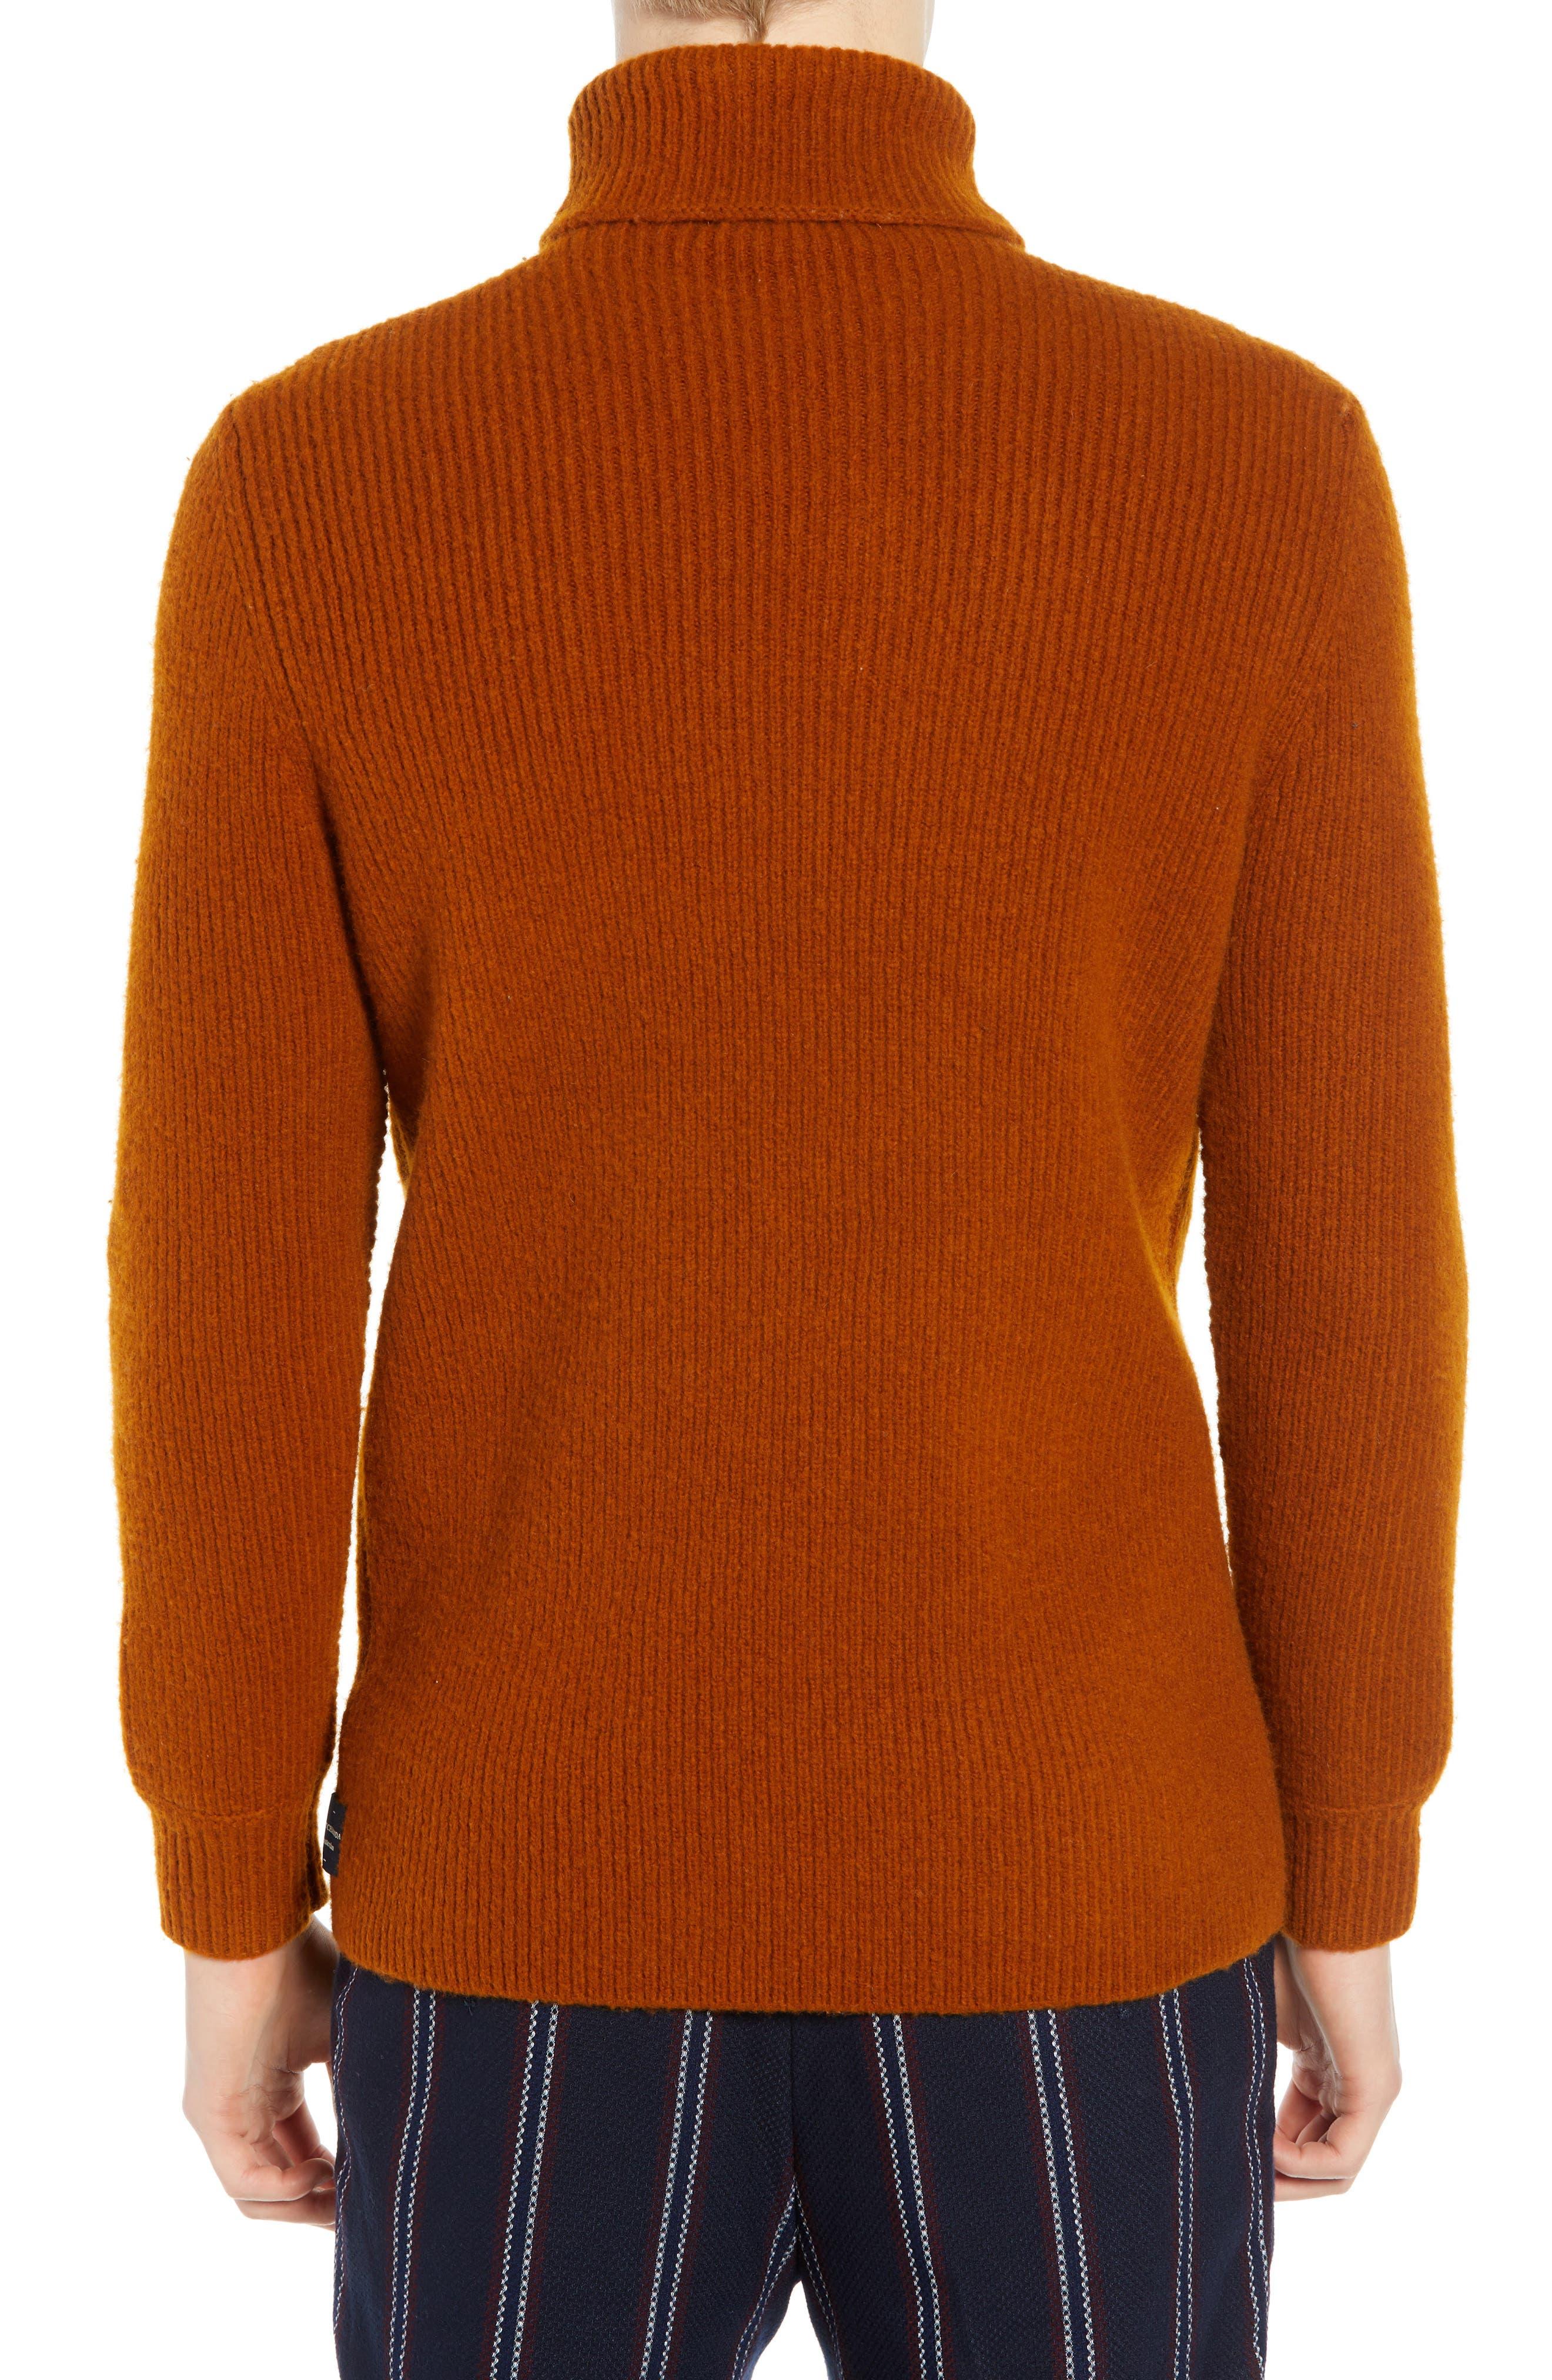 Wool Blend Turtleneck Sweater,                             Alternate thumbnail 2, color,                             RUSSET BROWN